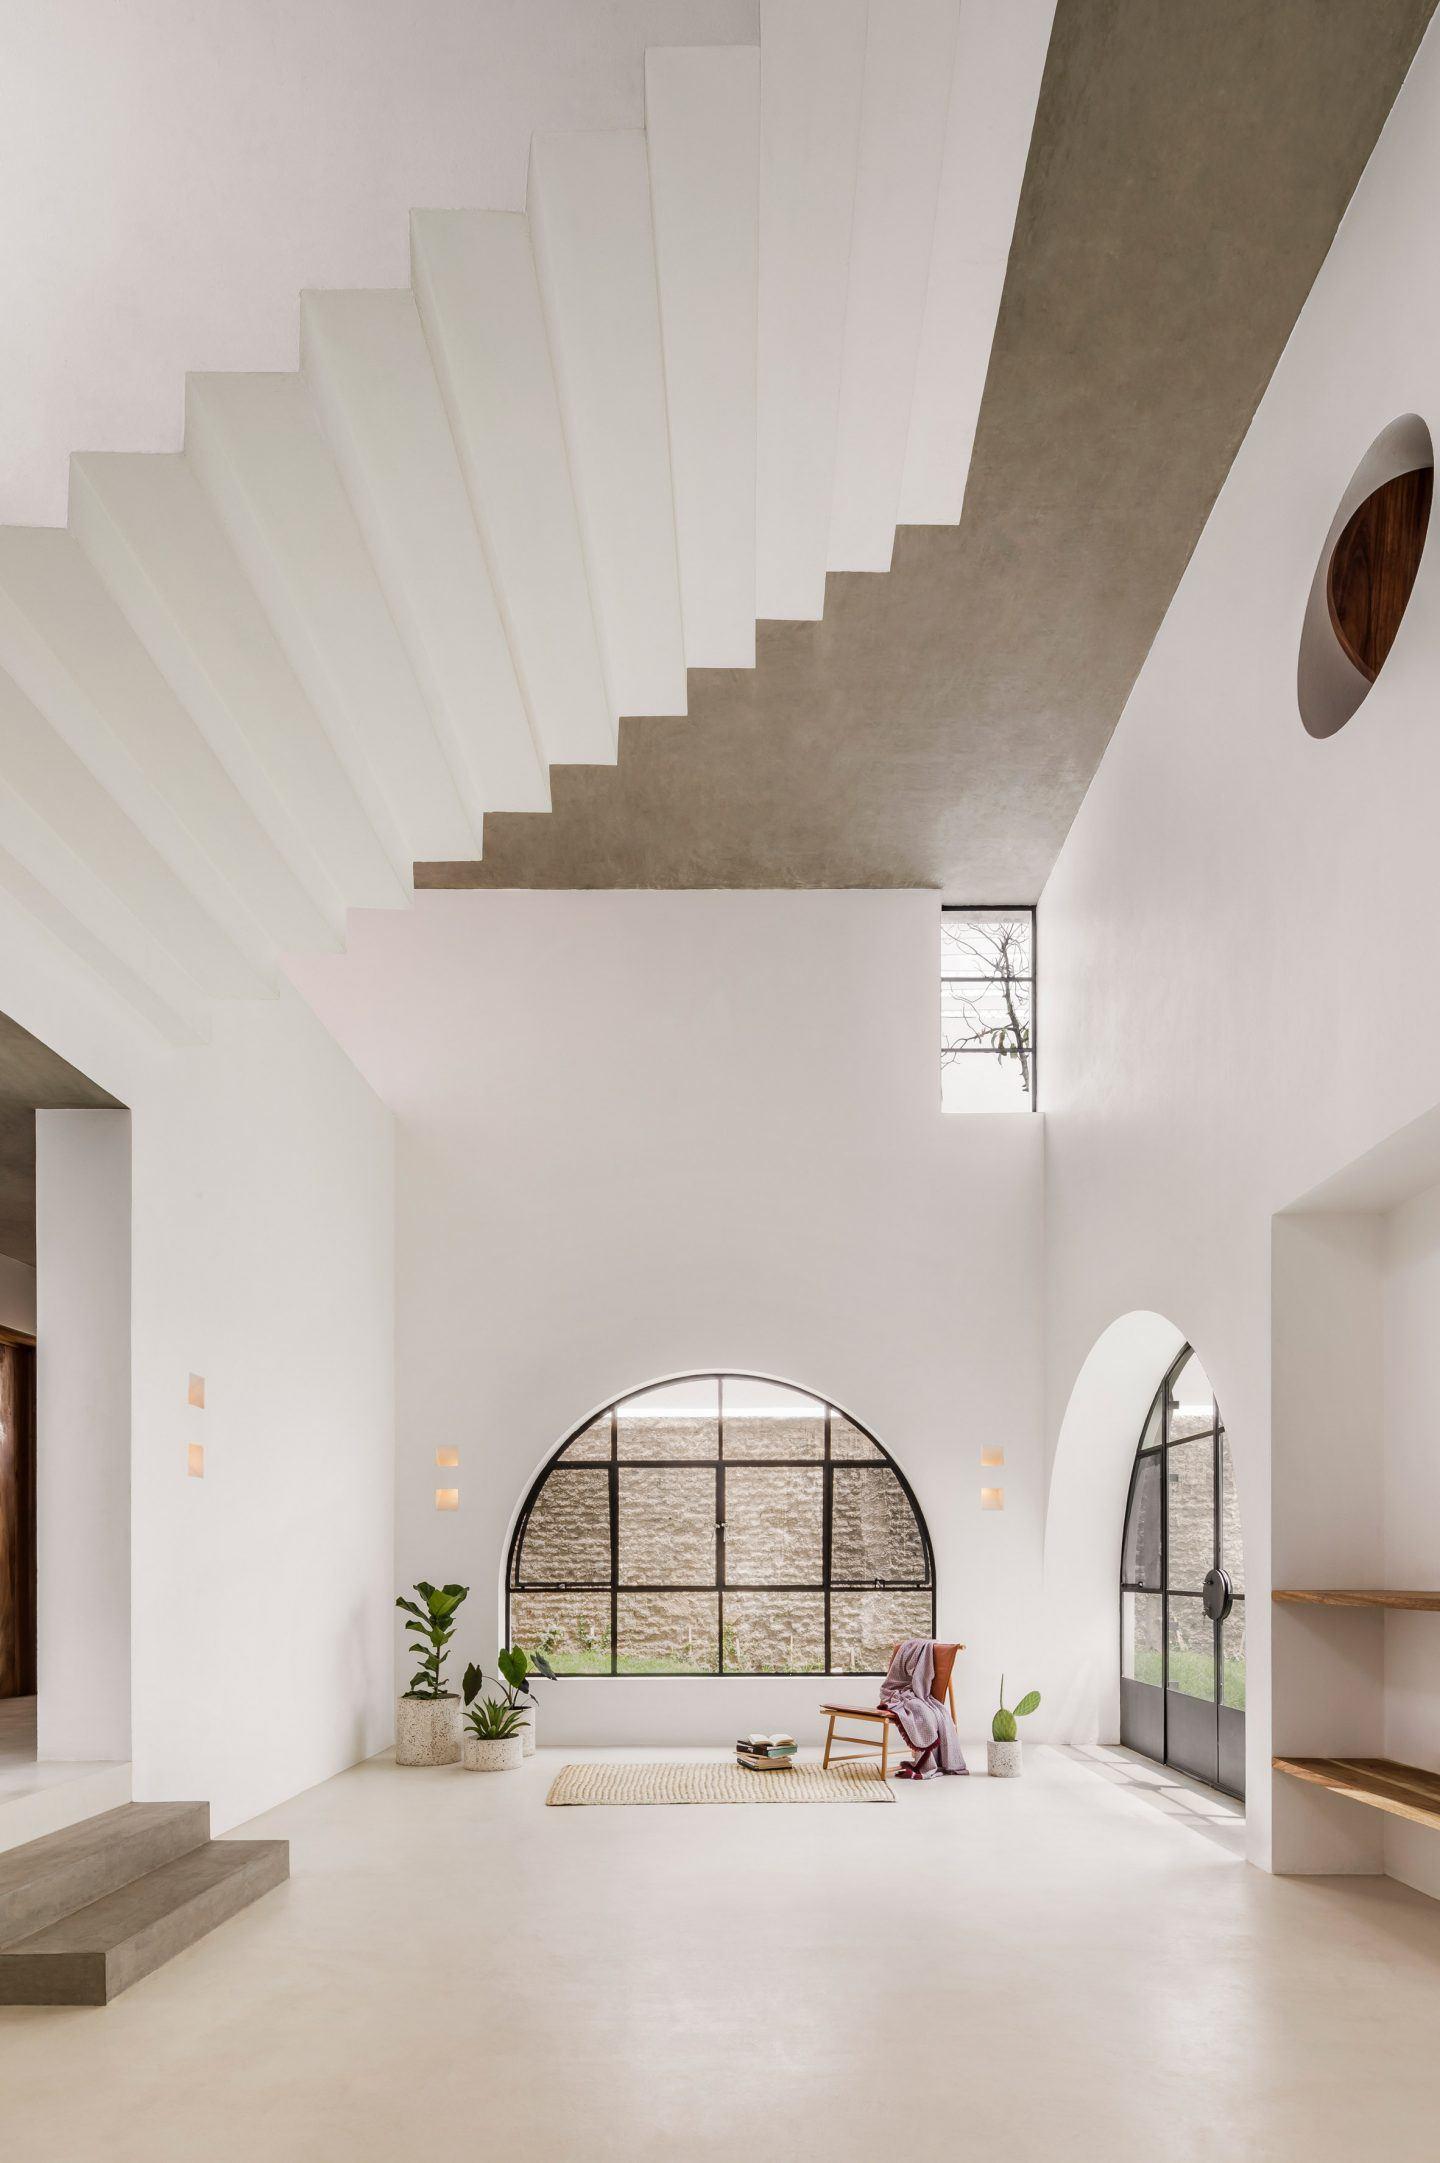 IGNANT-Architecture-Delfino-Lozano-Cesar-Bejar-Casa-690-09